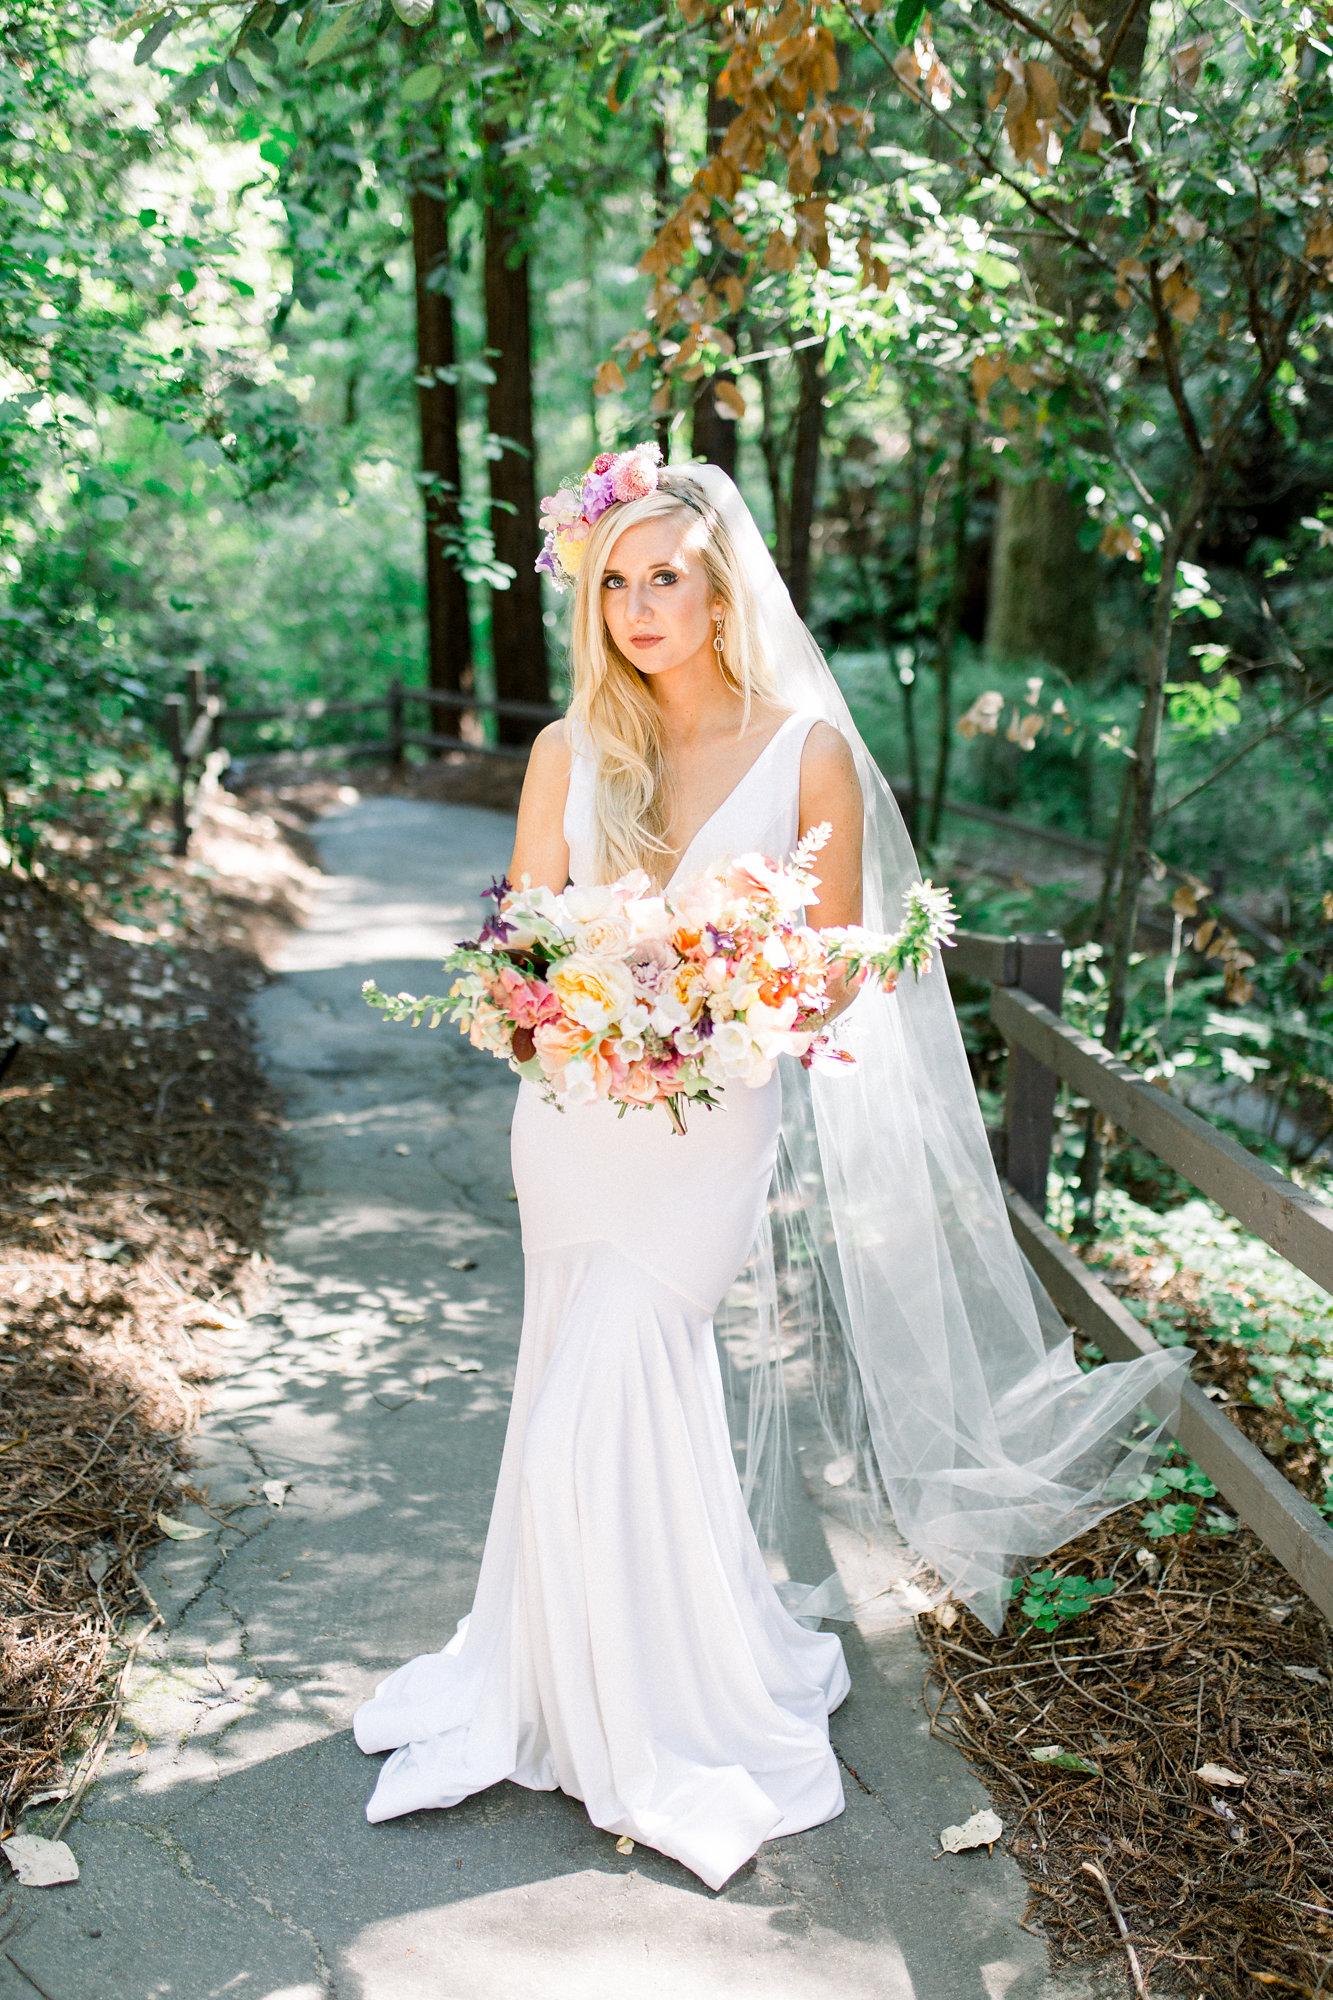 kim baker beauty luxury lifestyle and bridal makeup artist san jose bay area california onsite traveling camp harmon wedding style photoshoot amber dejoy photography bride portrait wedding